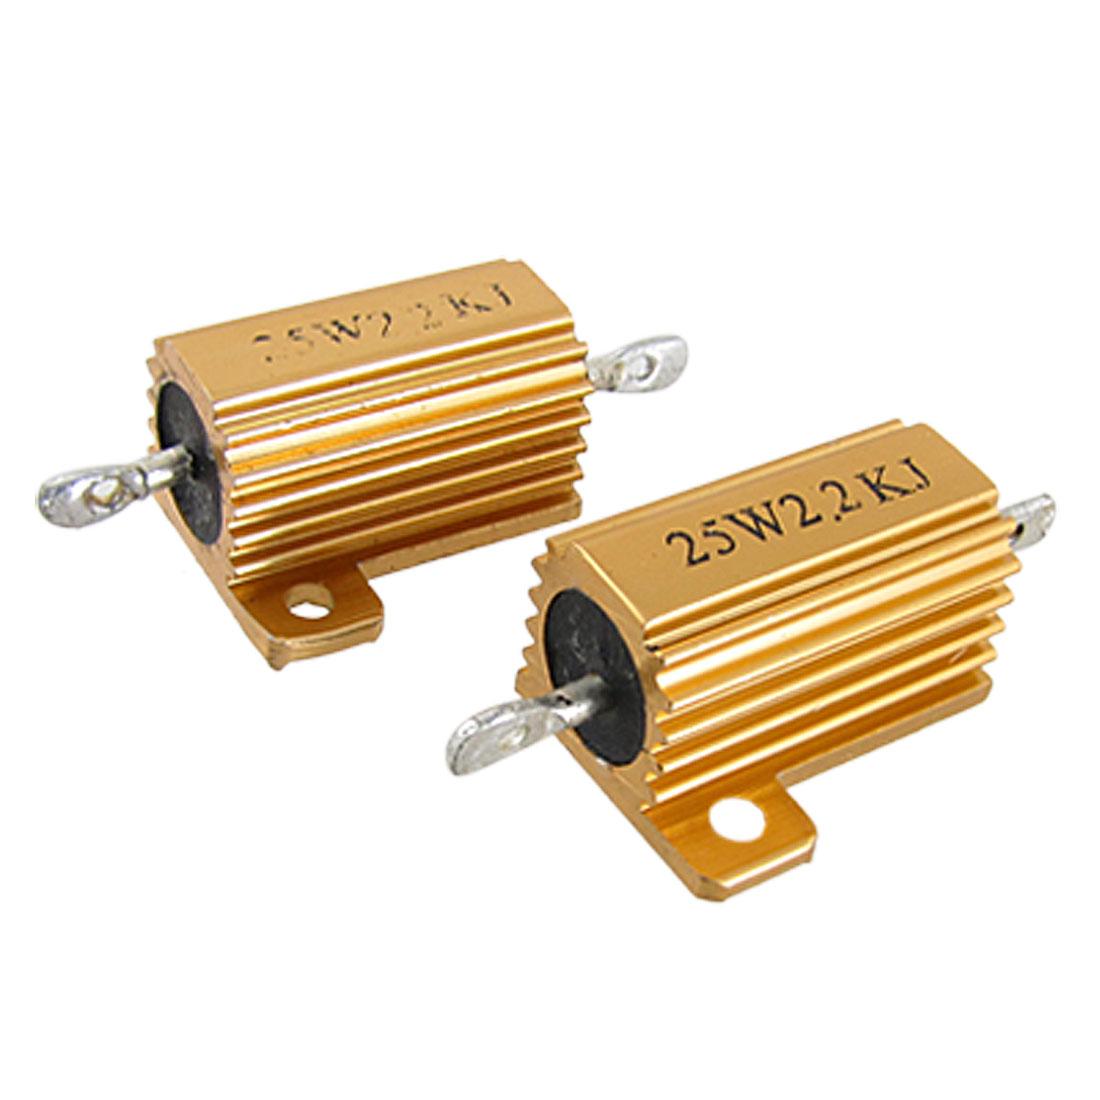 25W 2.2K Ohm 5% Aluminum Housed Wirewound Power Resistors 2 Pcs